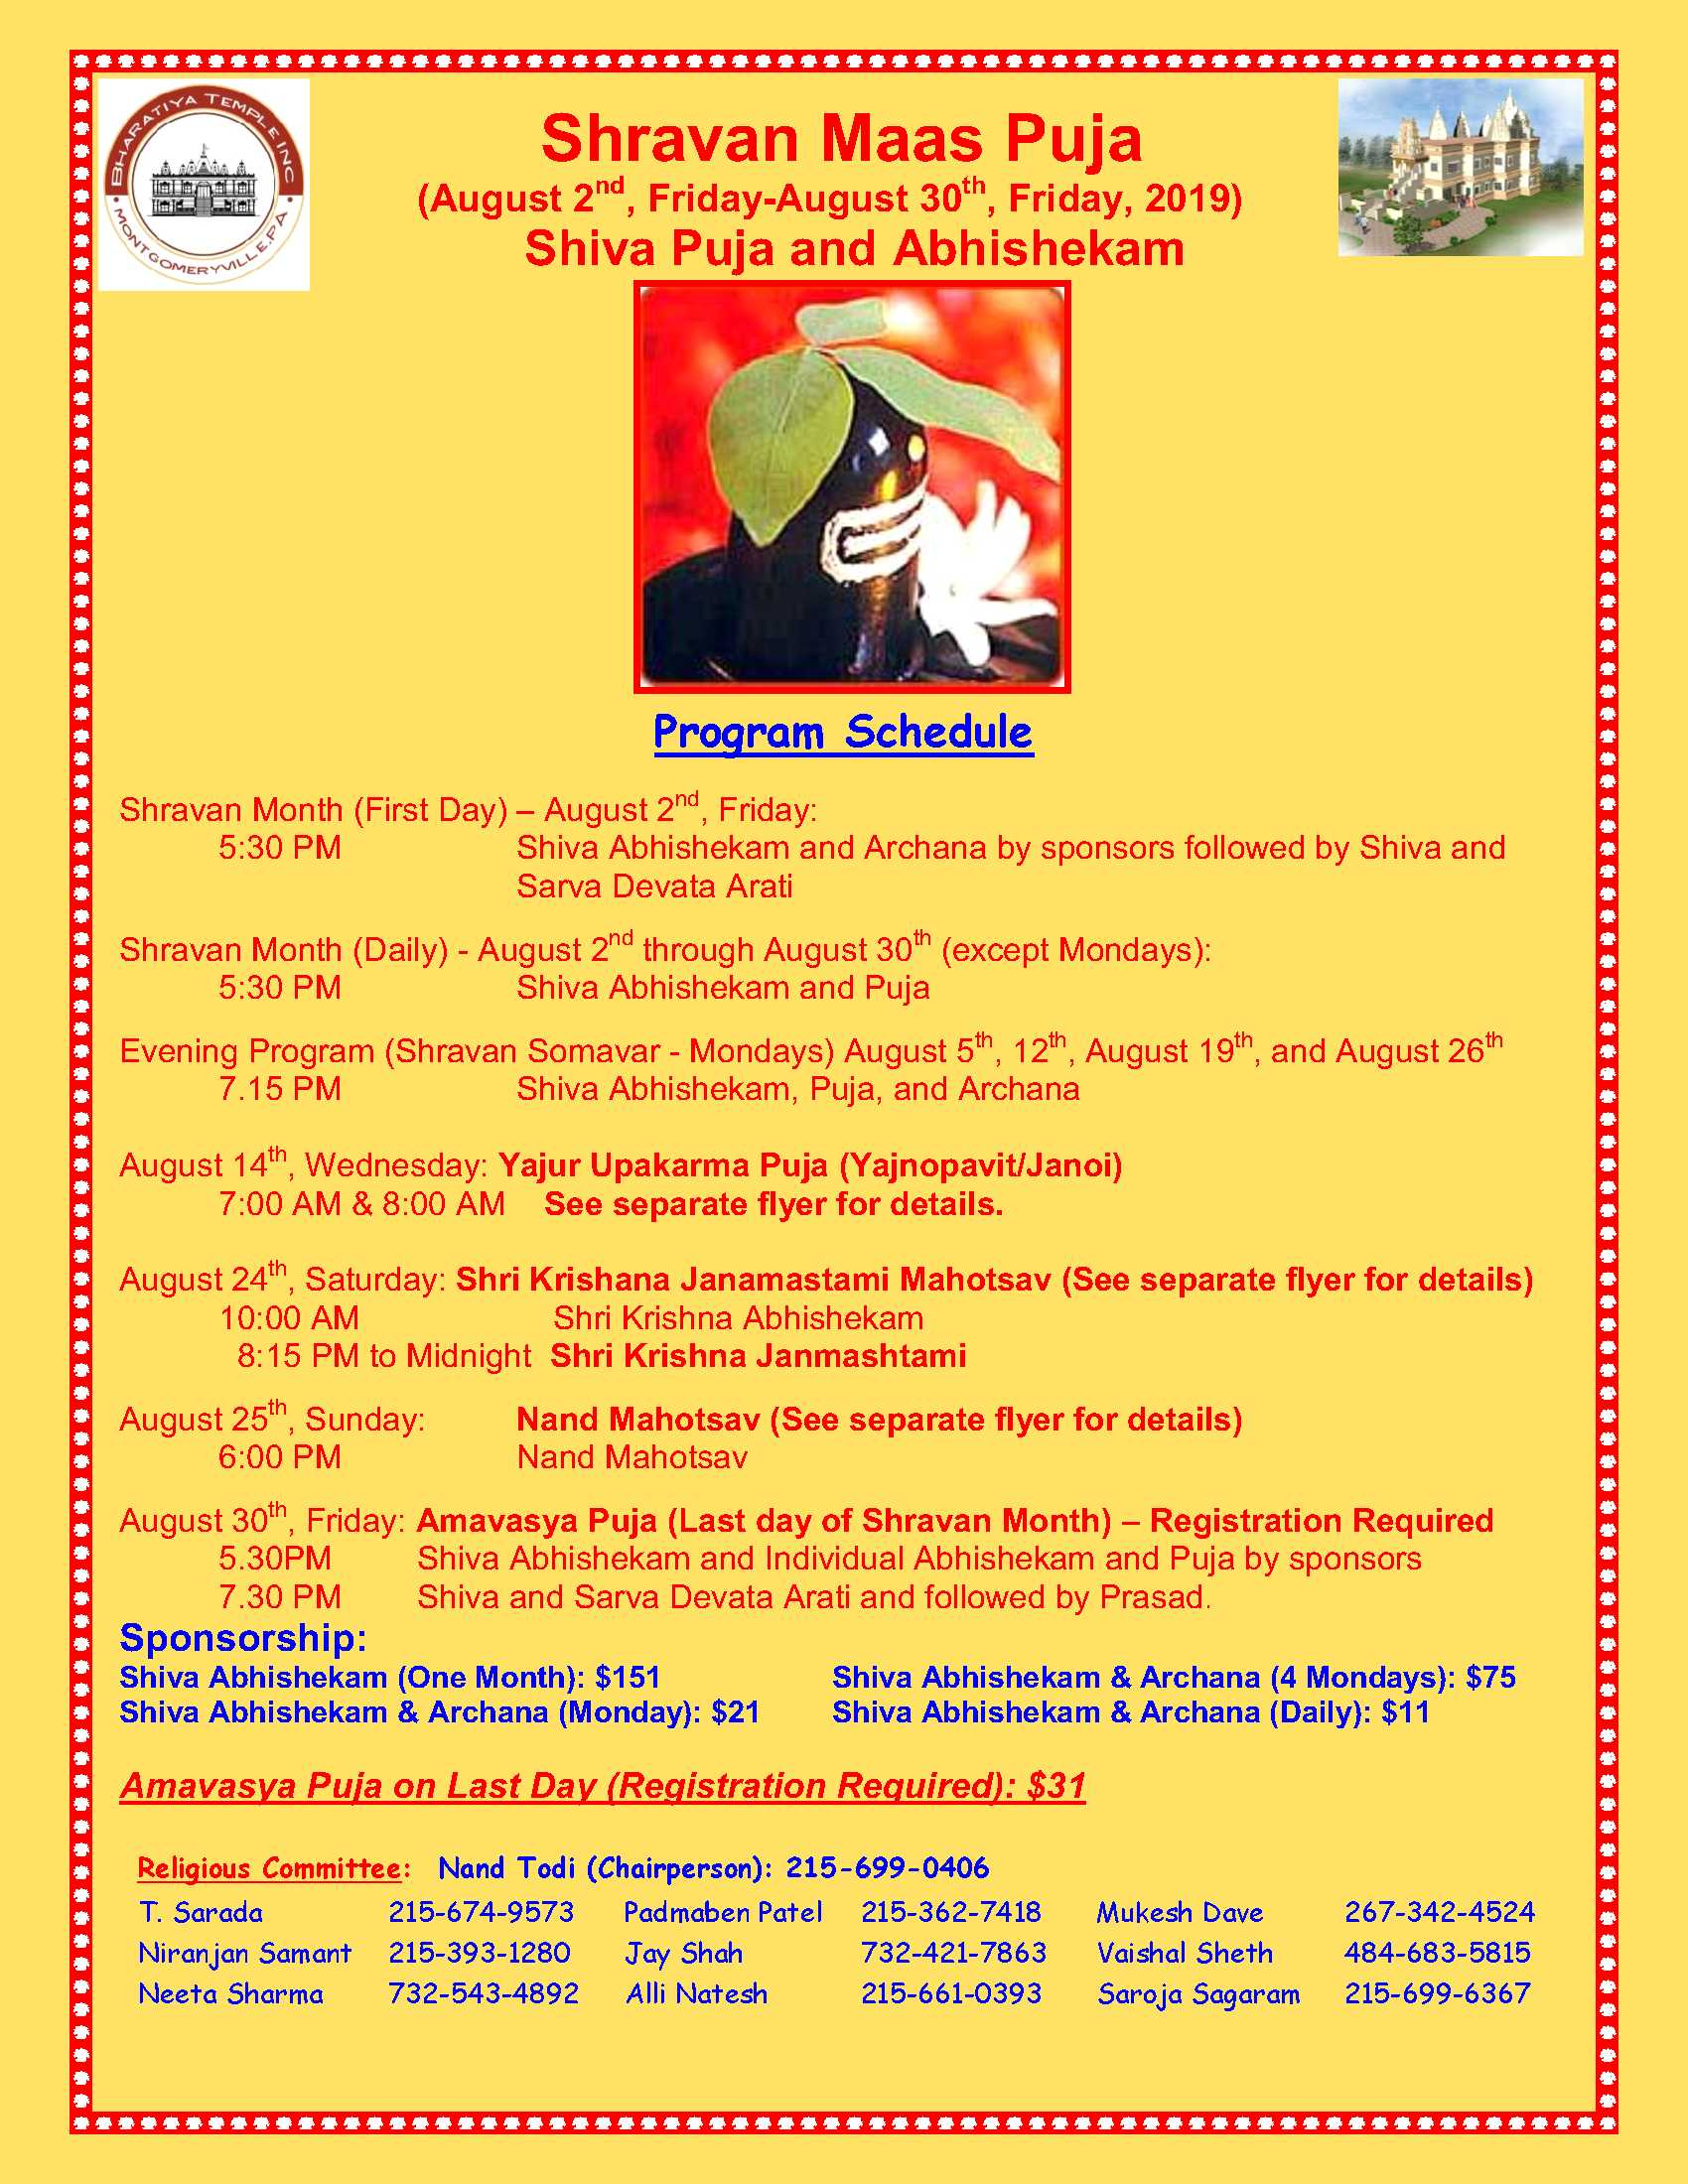 Shravan MaasAug-2nd to 30th - Bharatiya Temple Bharatiya Temple